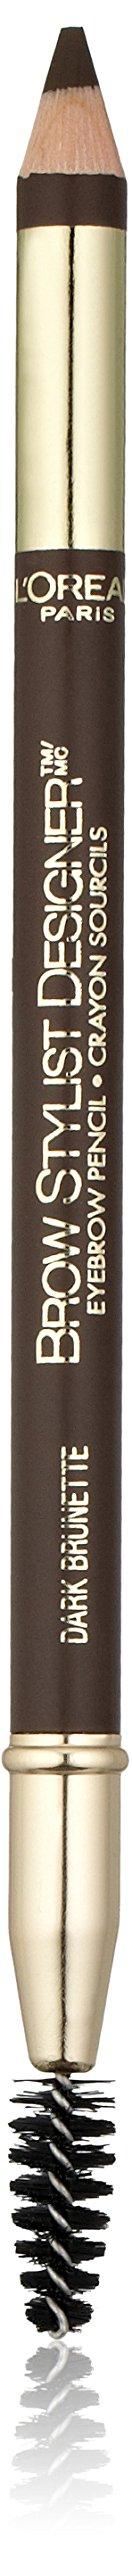 L'Oreal Paris Brow Stylist Designer Eyebrow Pencil, Dark Brunette [315] 0.045 oz